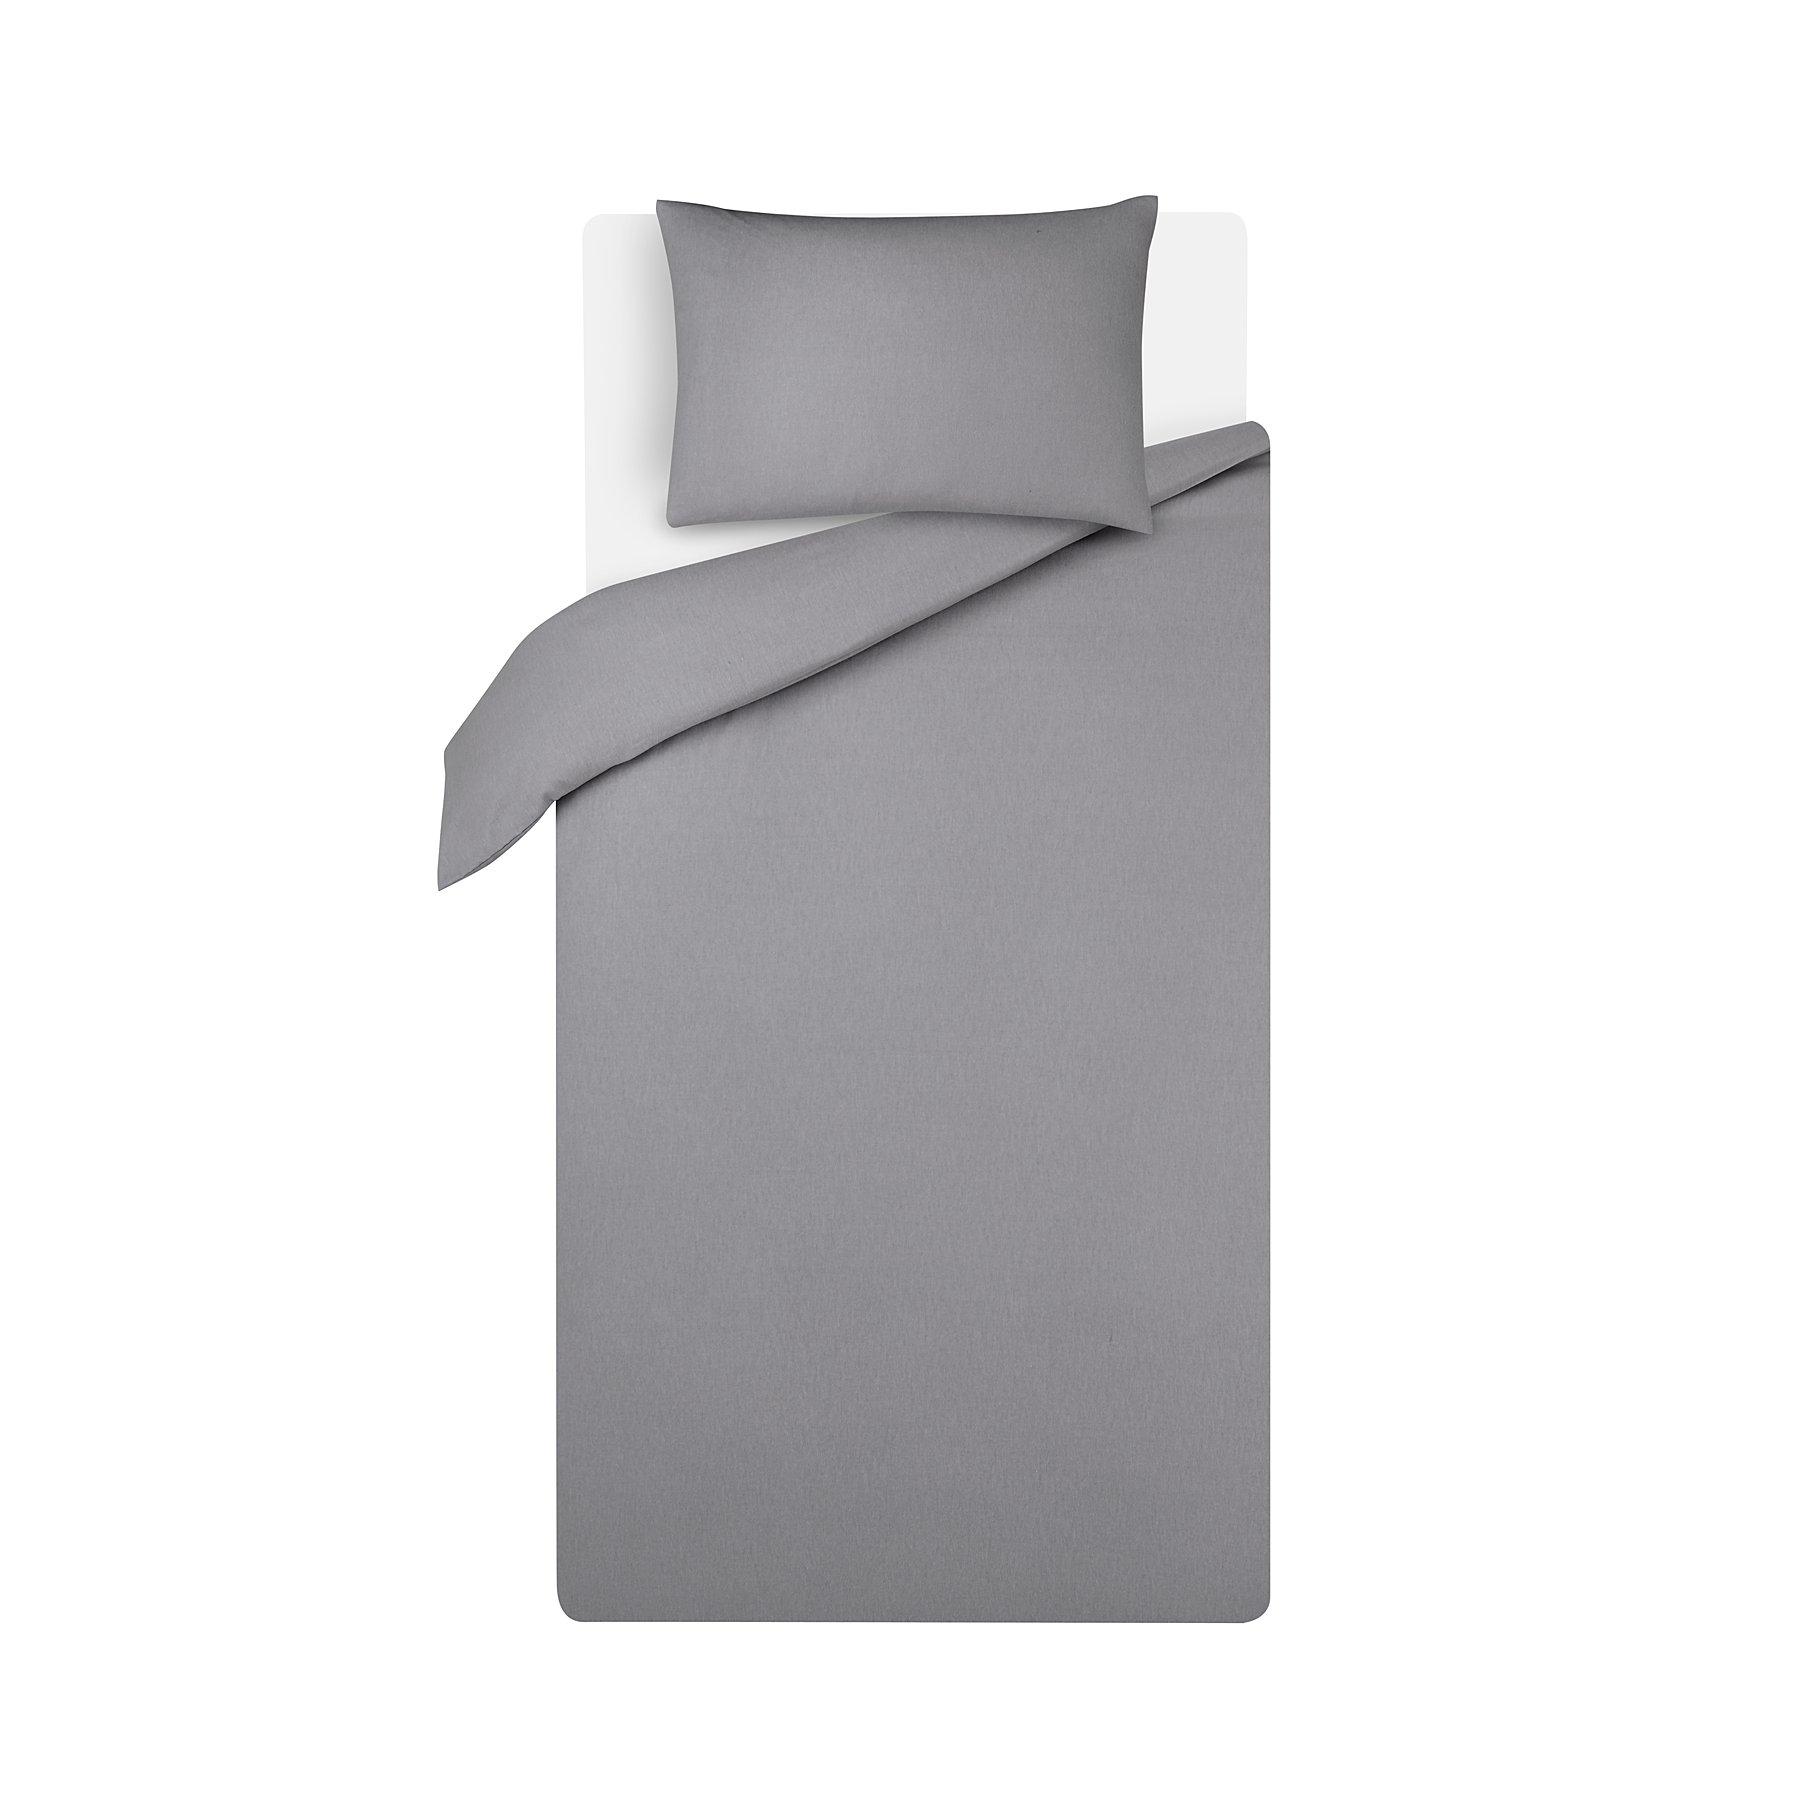 afd386012420 Grey Soft & Cosy Brushed Cotton Duvet Set   Home   George